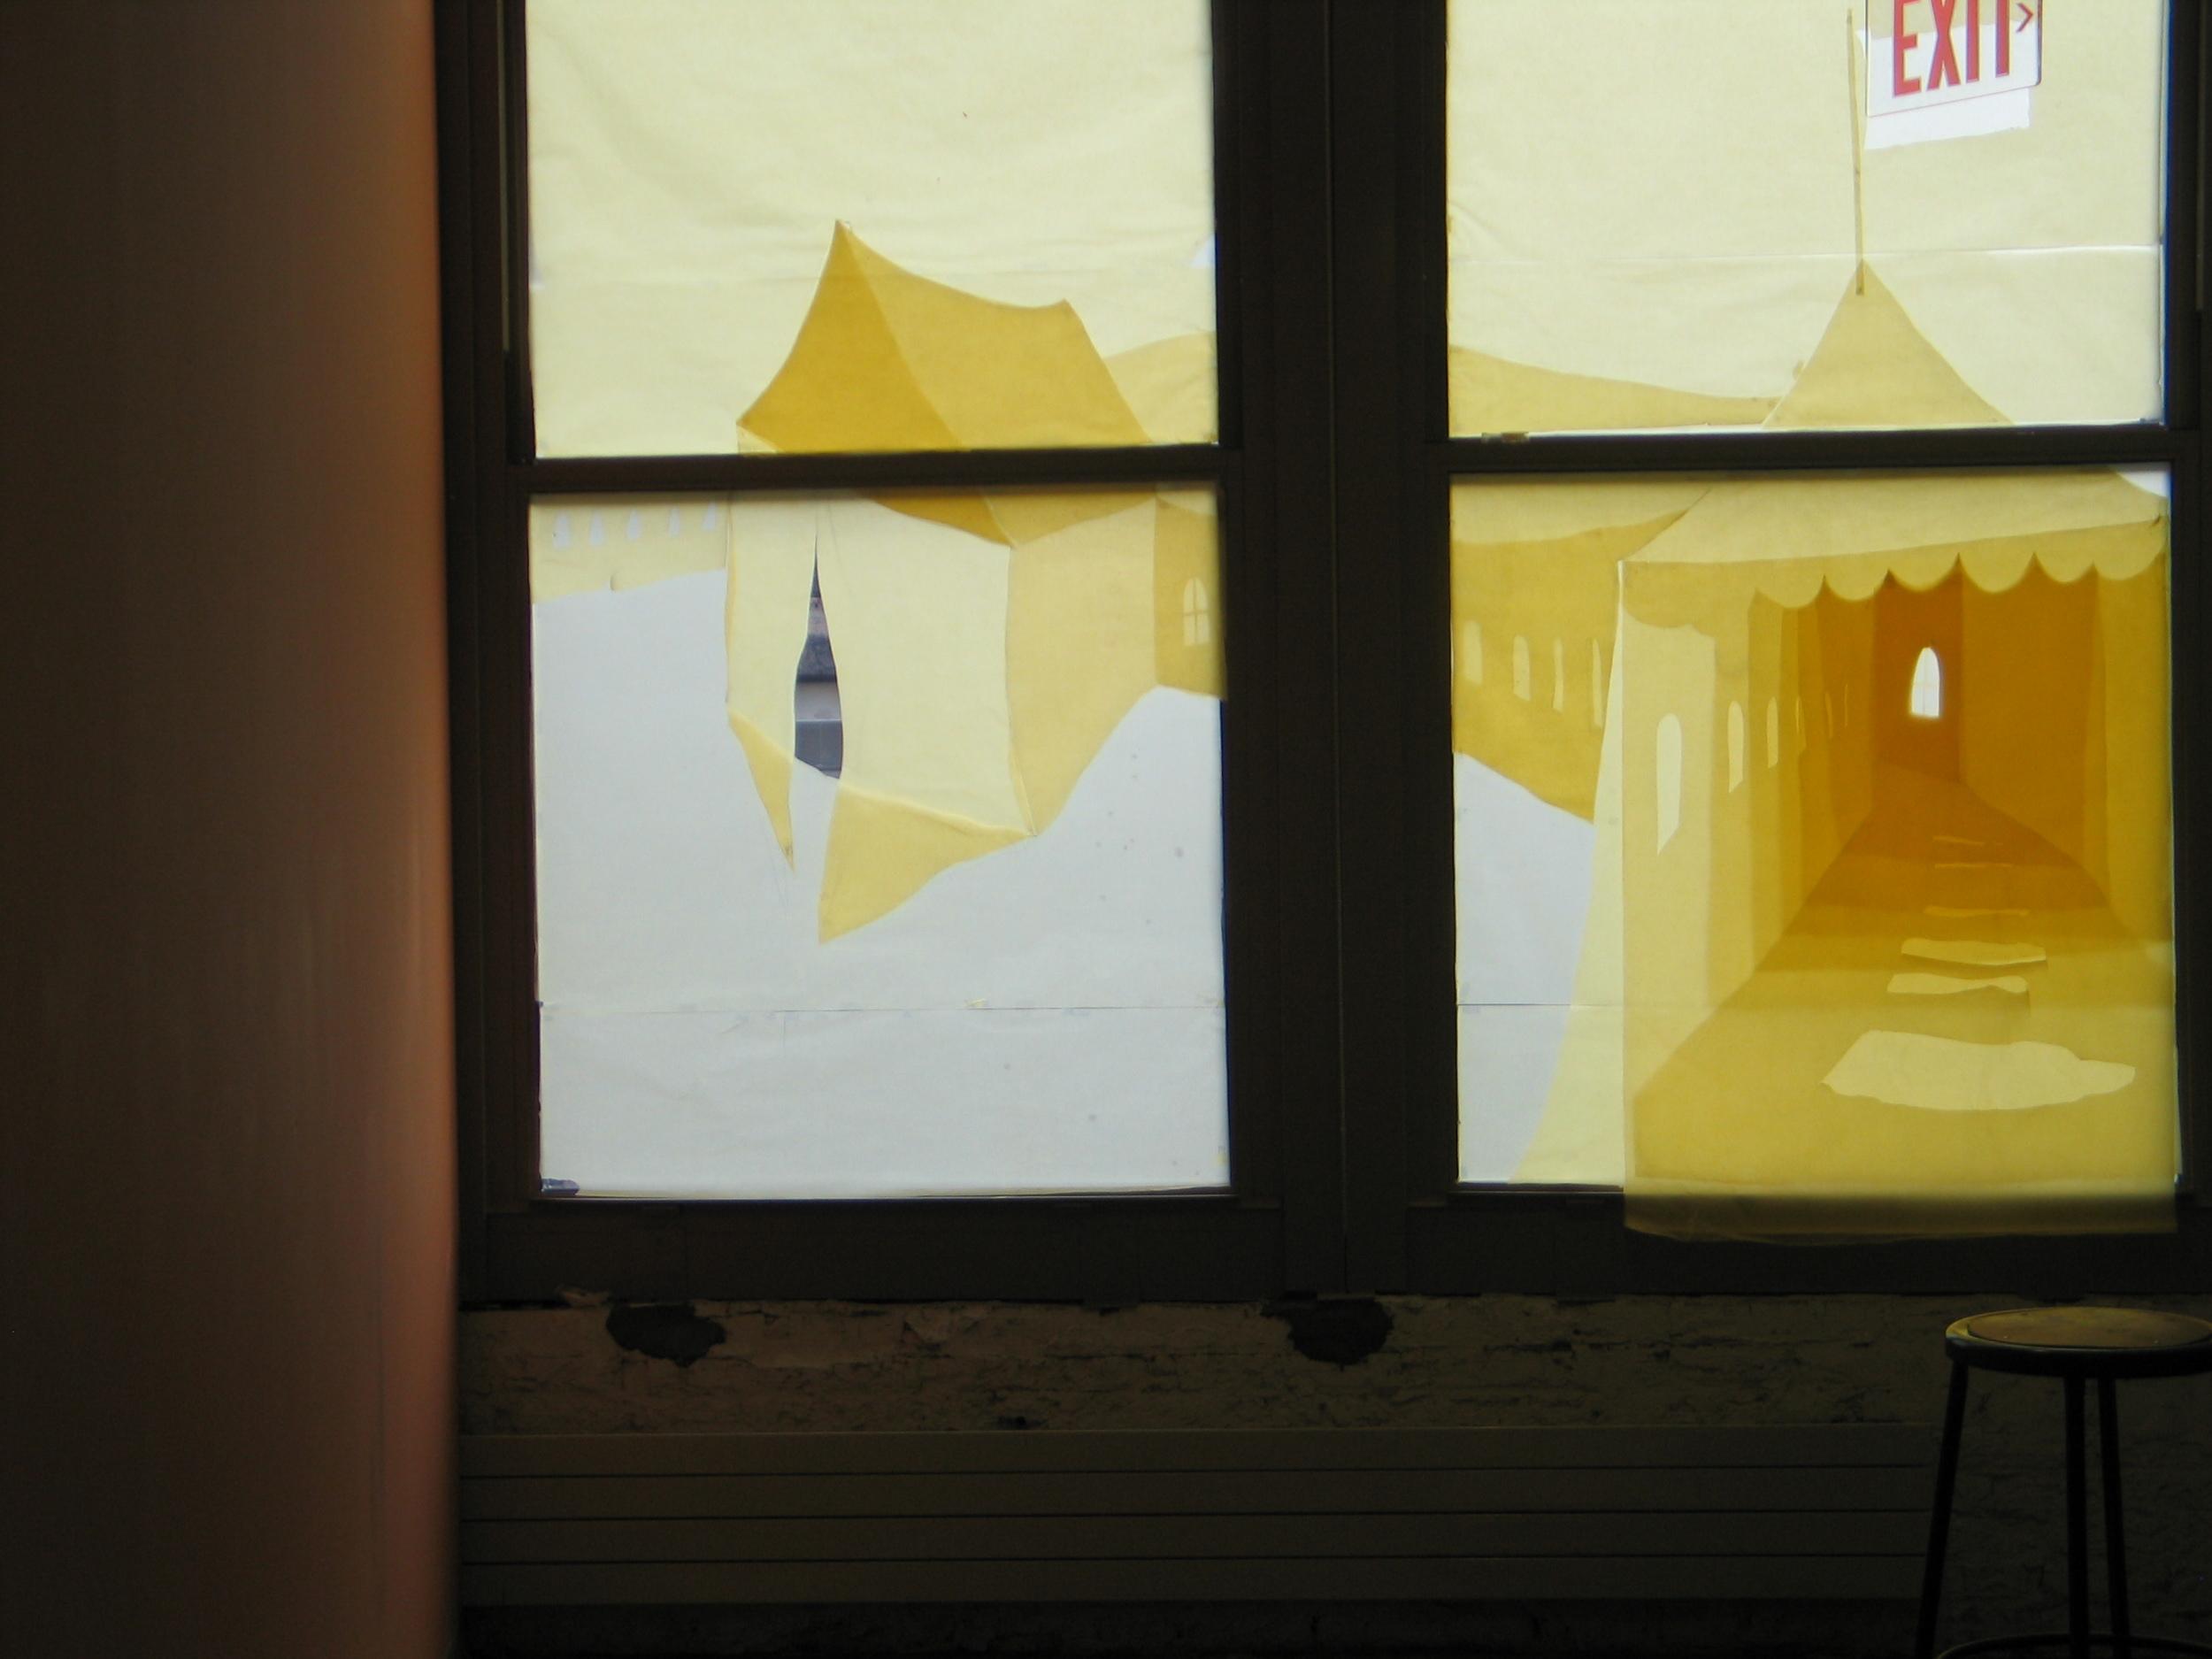 yellowtent 026.jpg